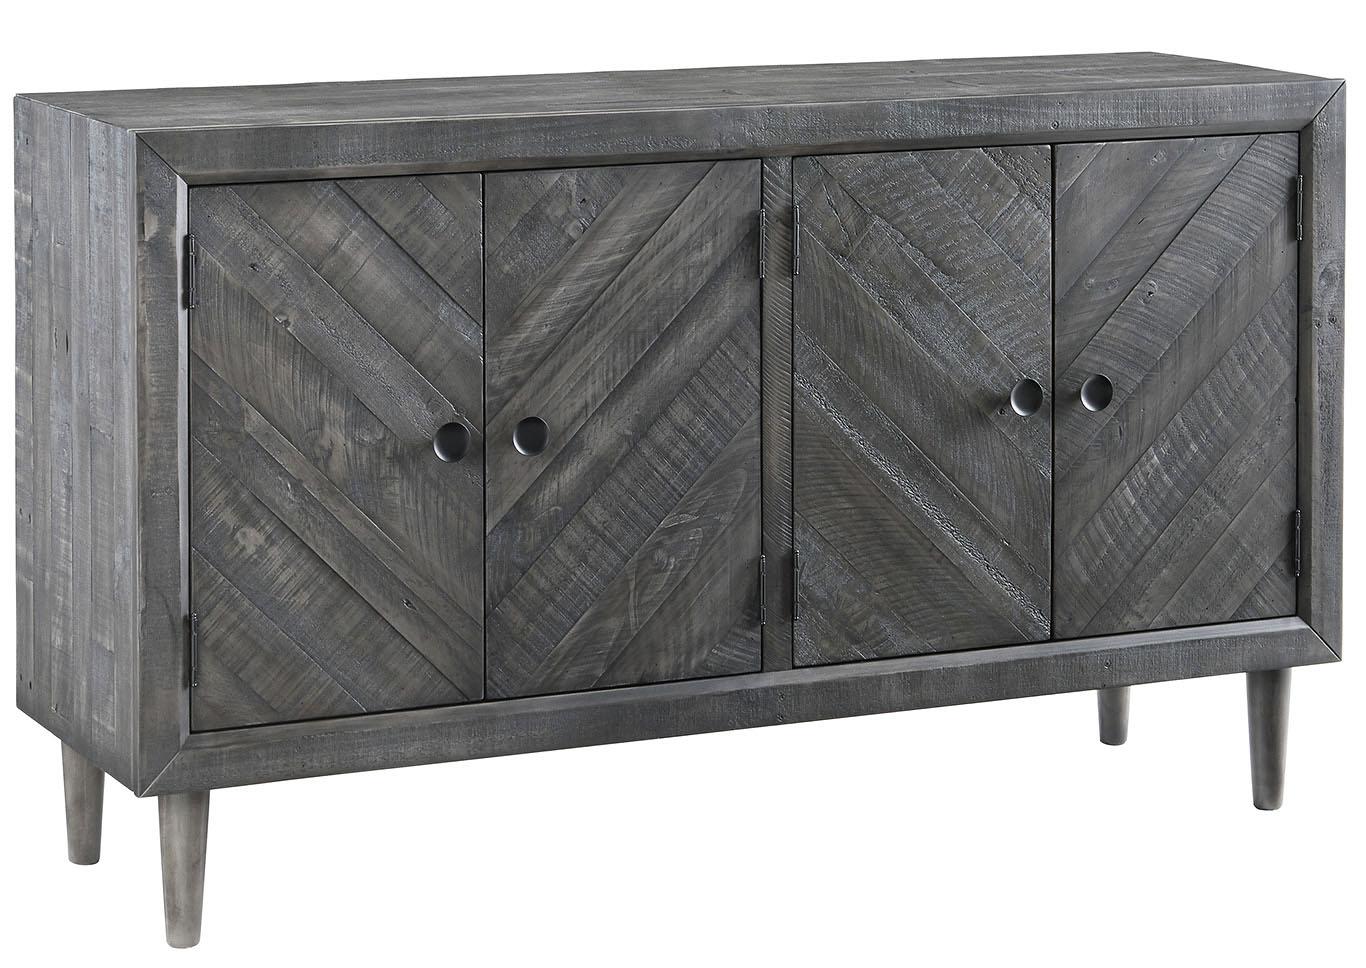 Superb Besteneer Dark Gray Dining Room Server,Signature Design By Ashley